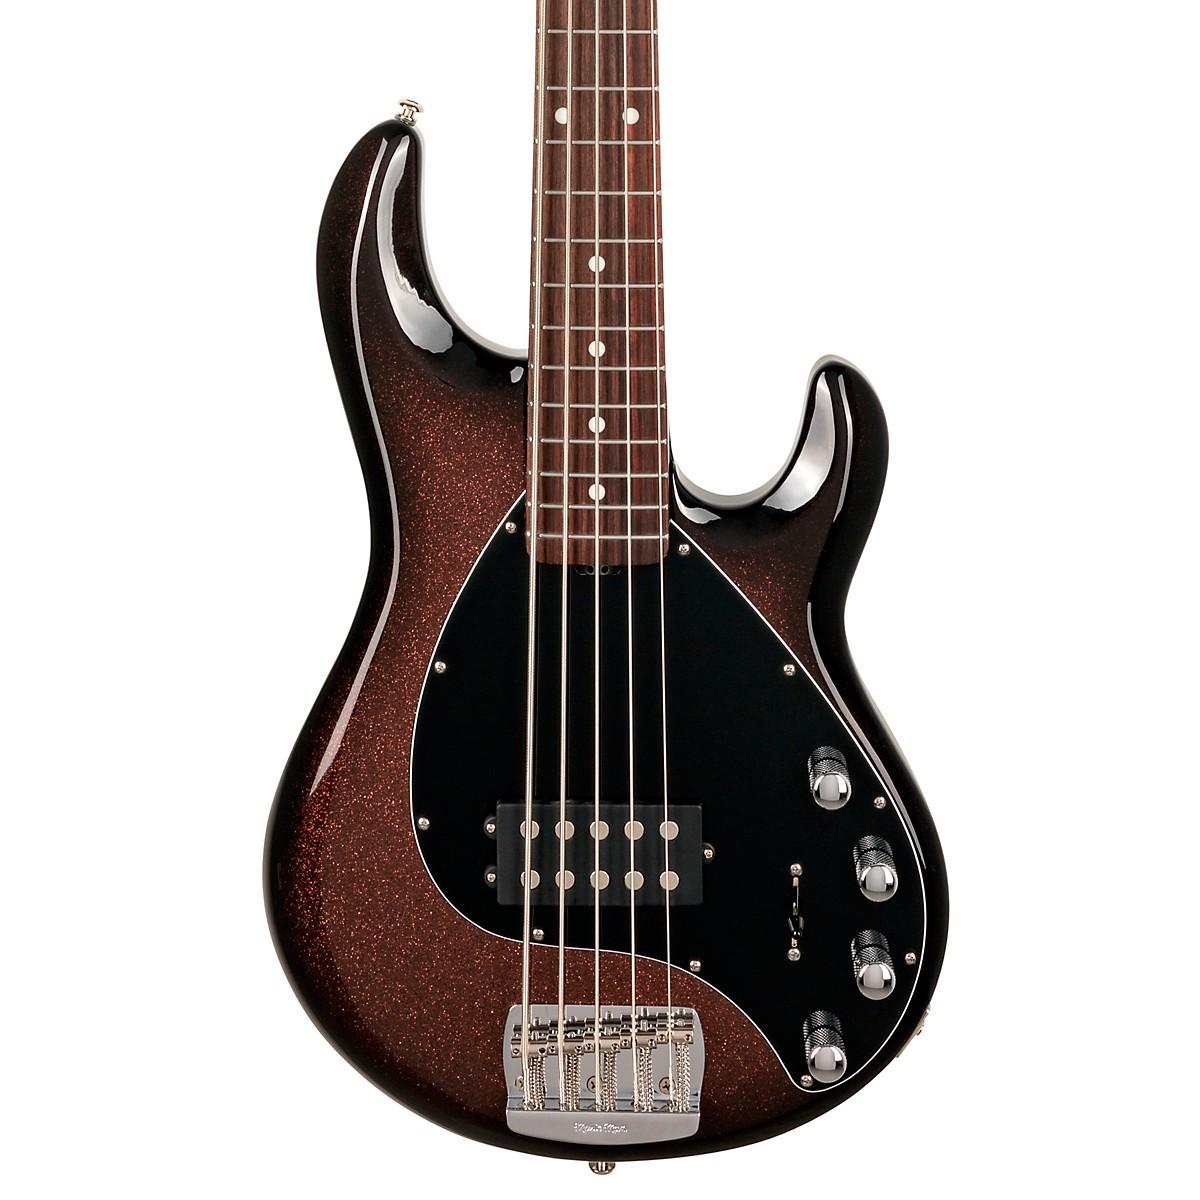 Ernie Ball Music Man Stingray 5 BFR 5-String Bass